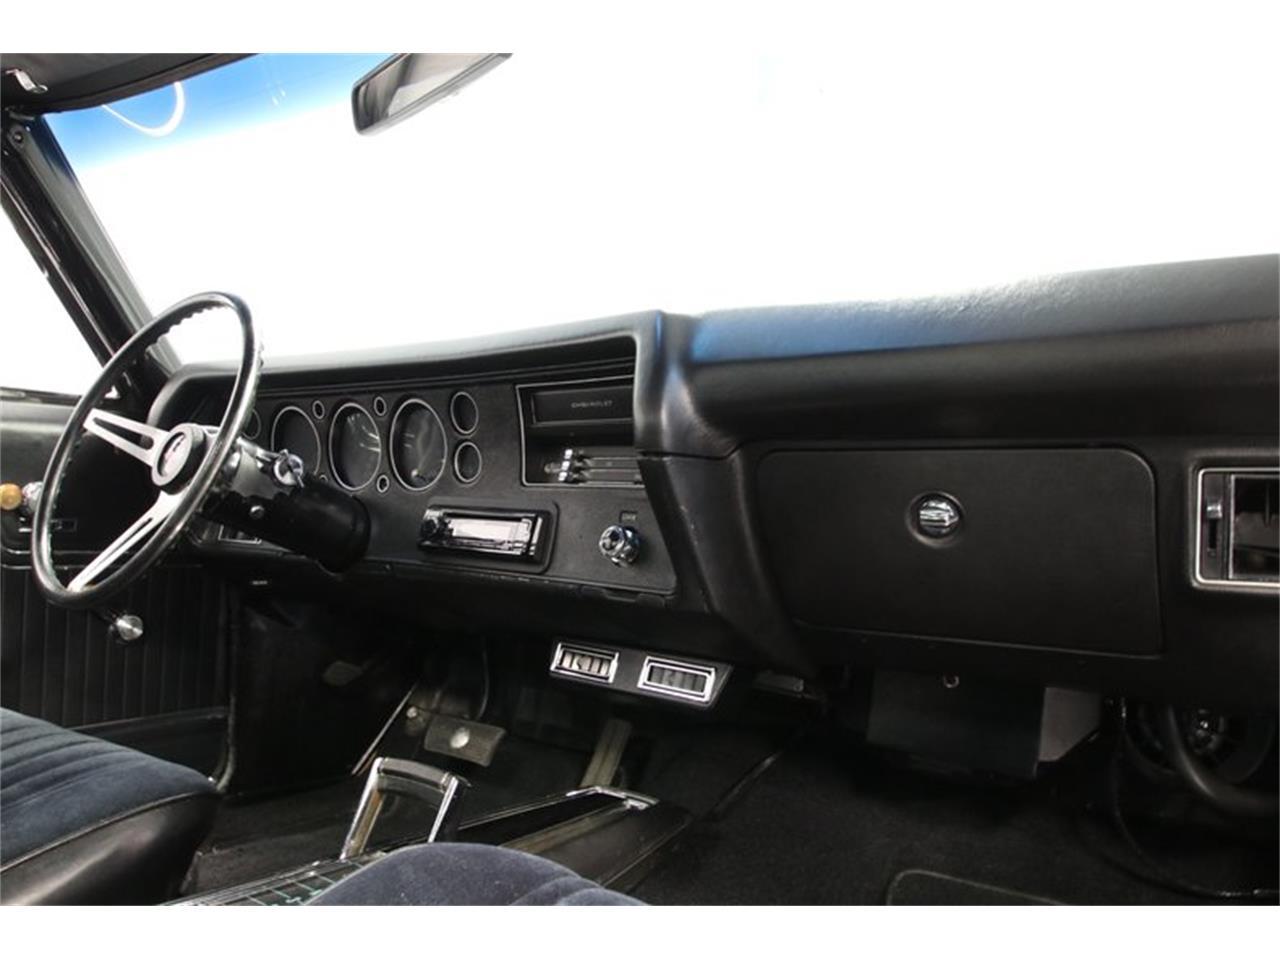 1970 Chevrolet El Camino (CC-1419833) for sale in Concord, North Carolina